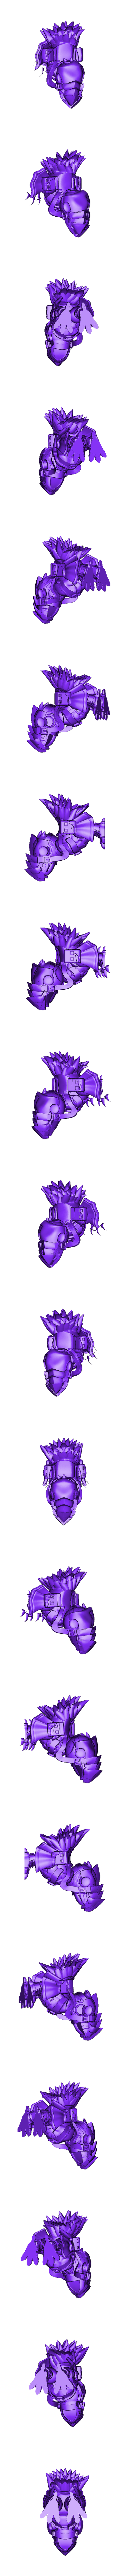 Knight_Peco_Peco.stl Download free STL file Chibi Knight Peco Peco • 3D print template, HyperMiniatures